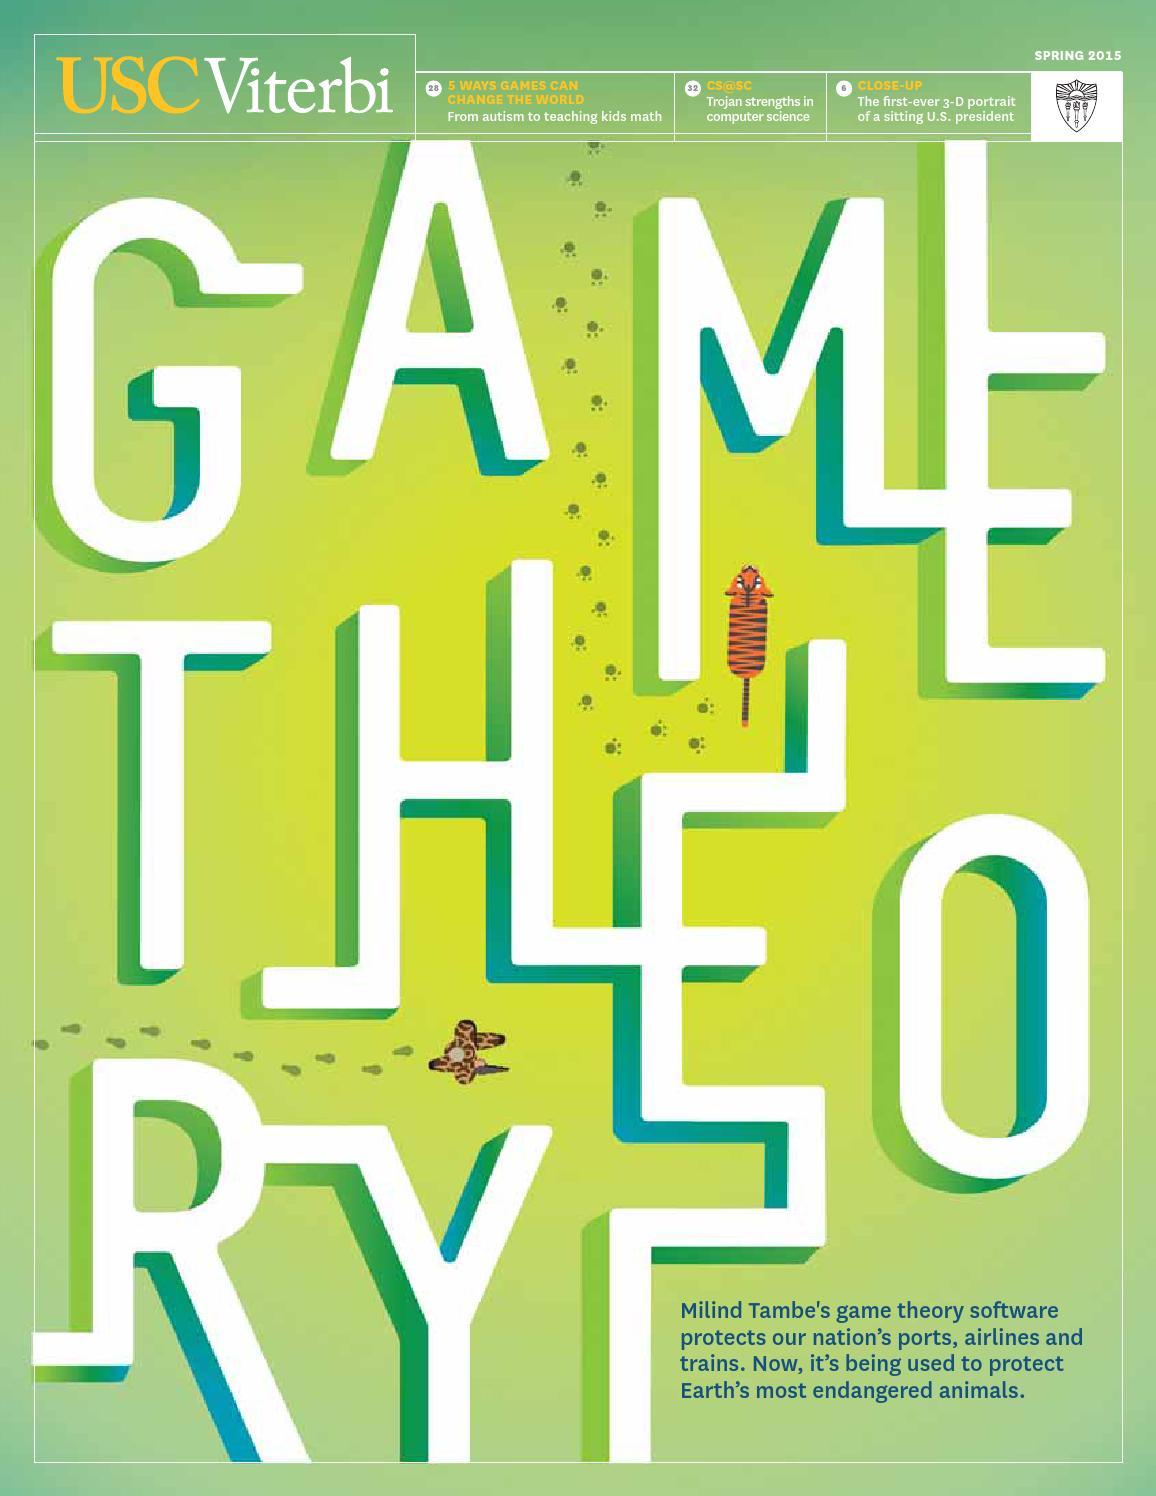 50b064b9 USC Viterbi: Game Theory. Spring 2015 by University of Southern California  - issuu